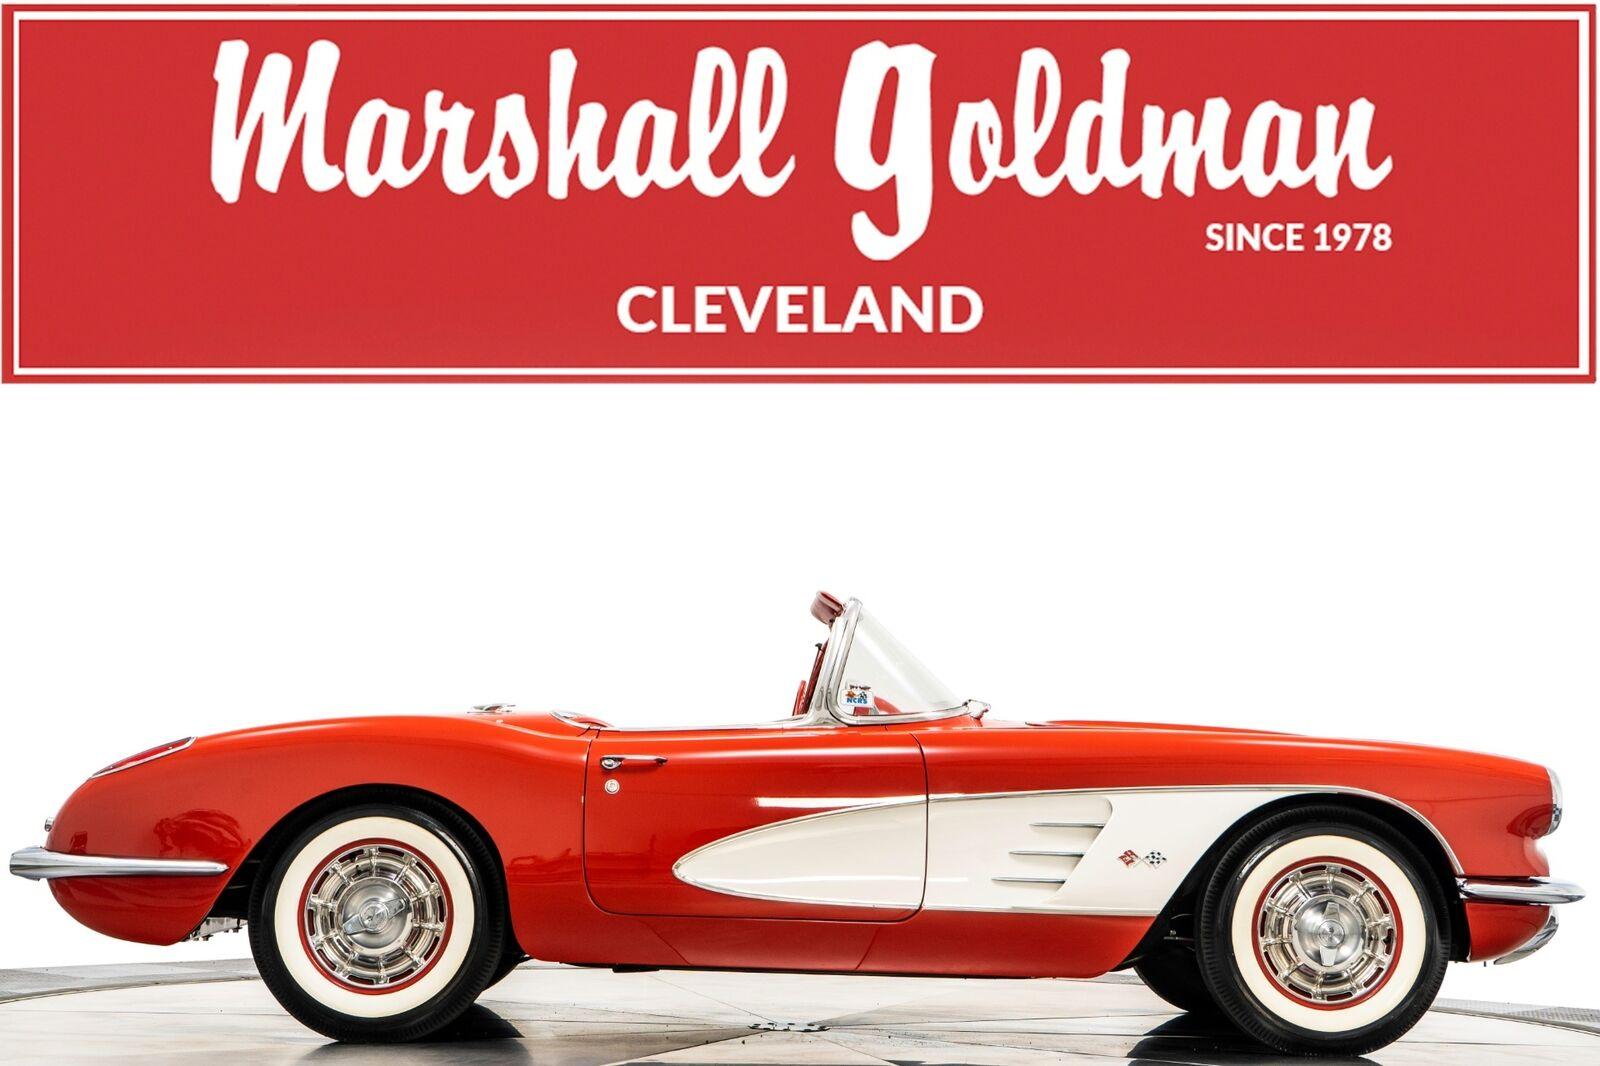 1960 Red Chevrolet Corvette   | C1 Corvette Photo 1